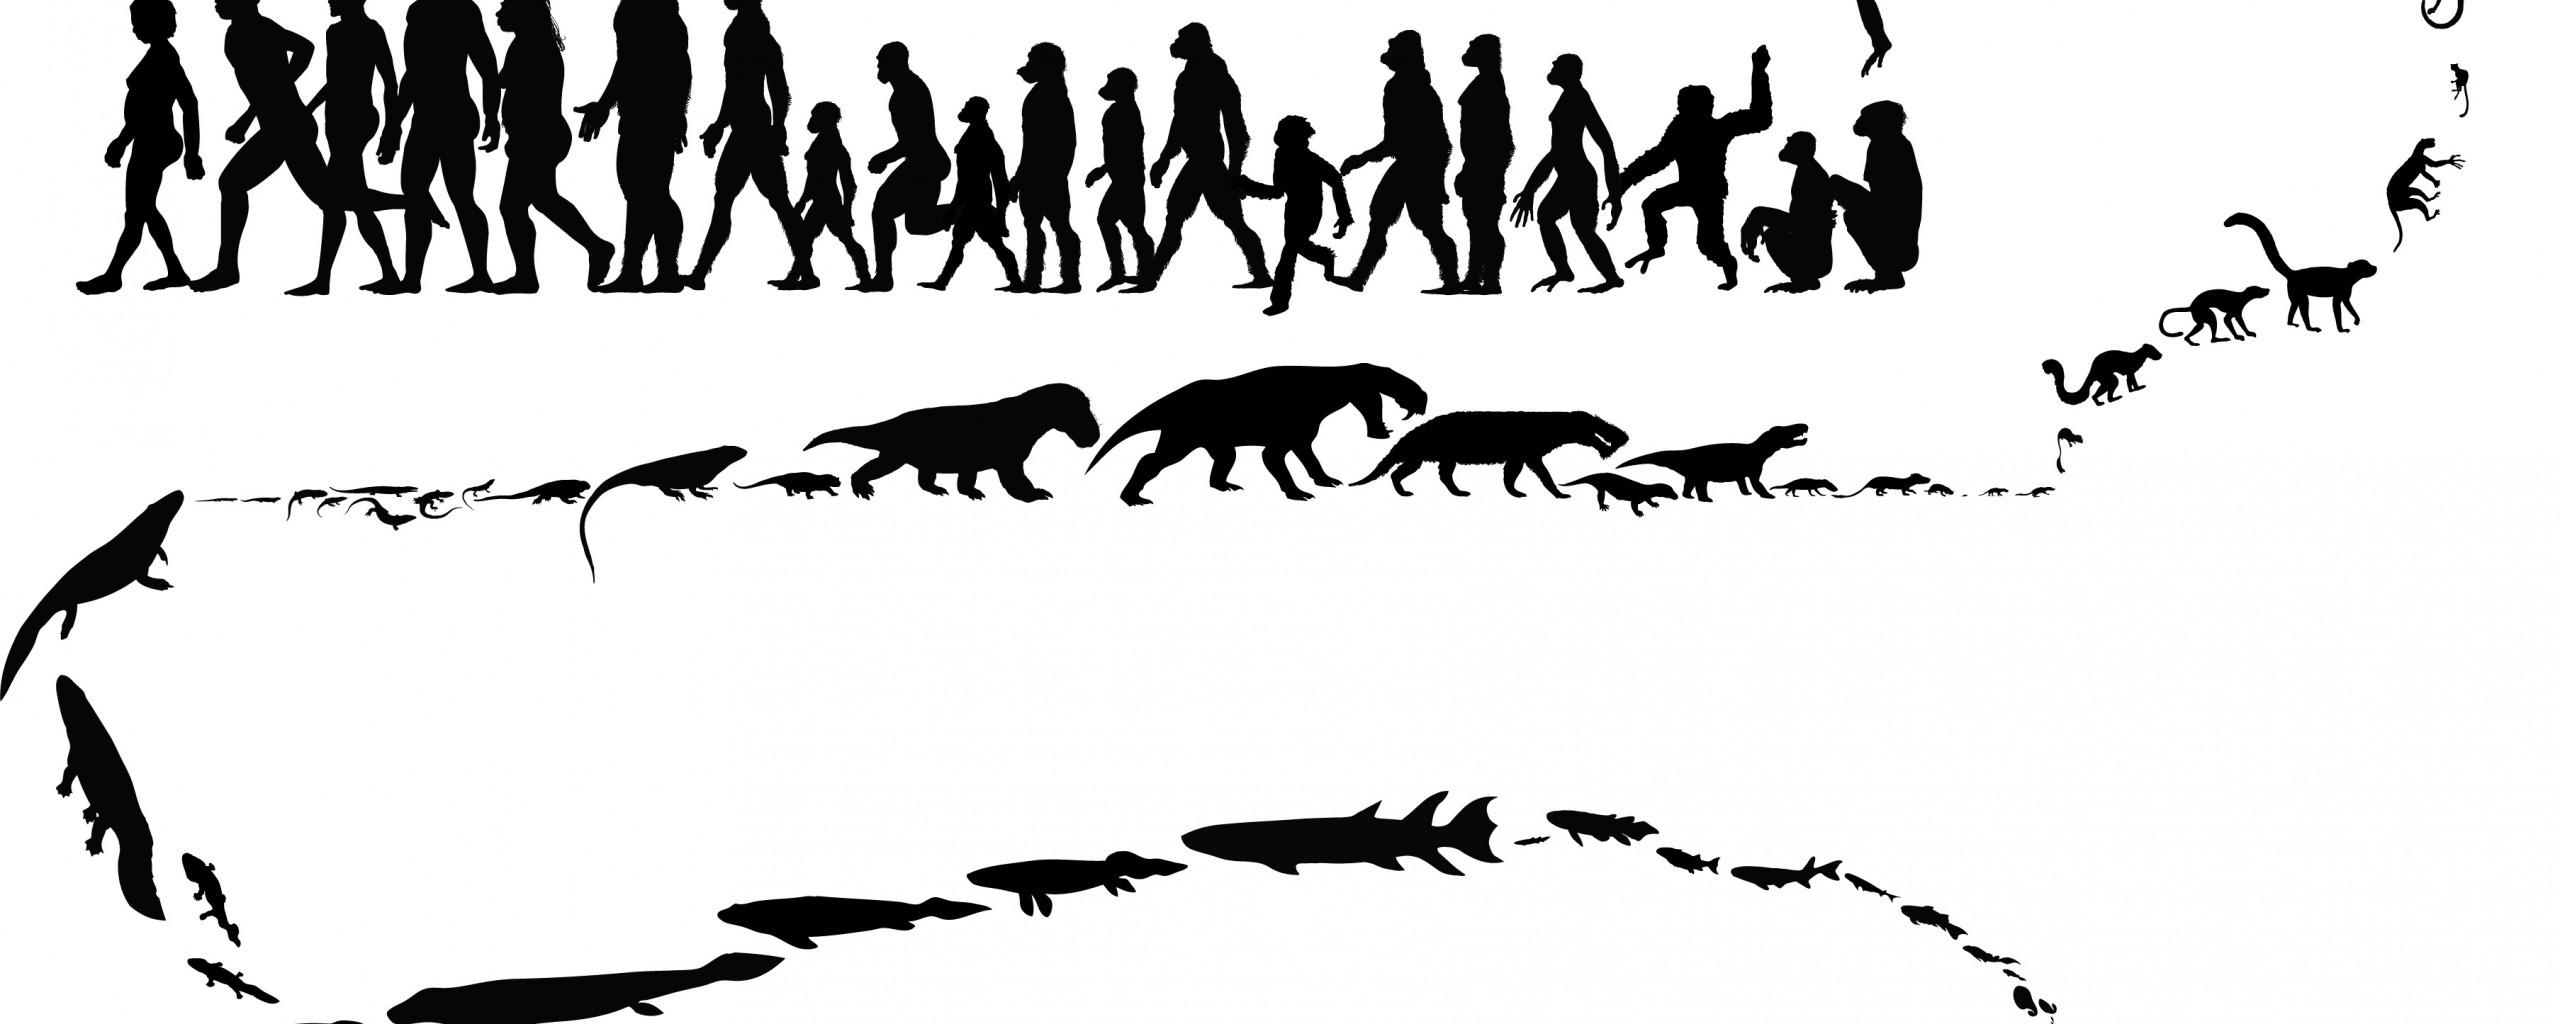 Картинка три, эволюция дарвина в картинках